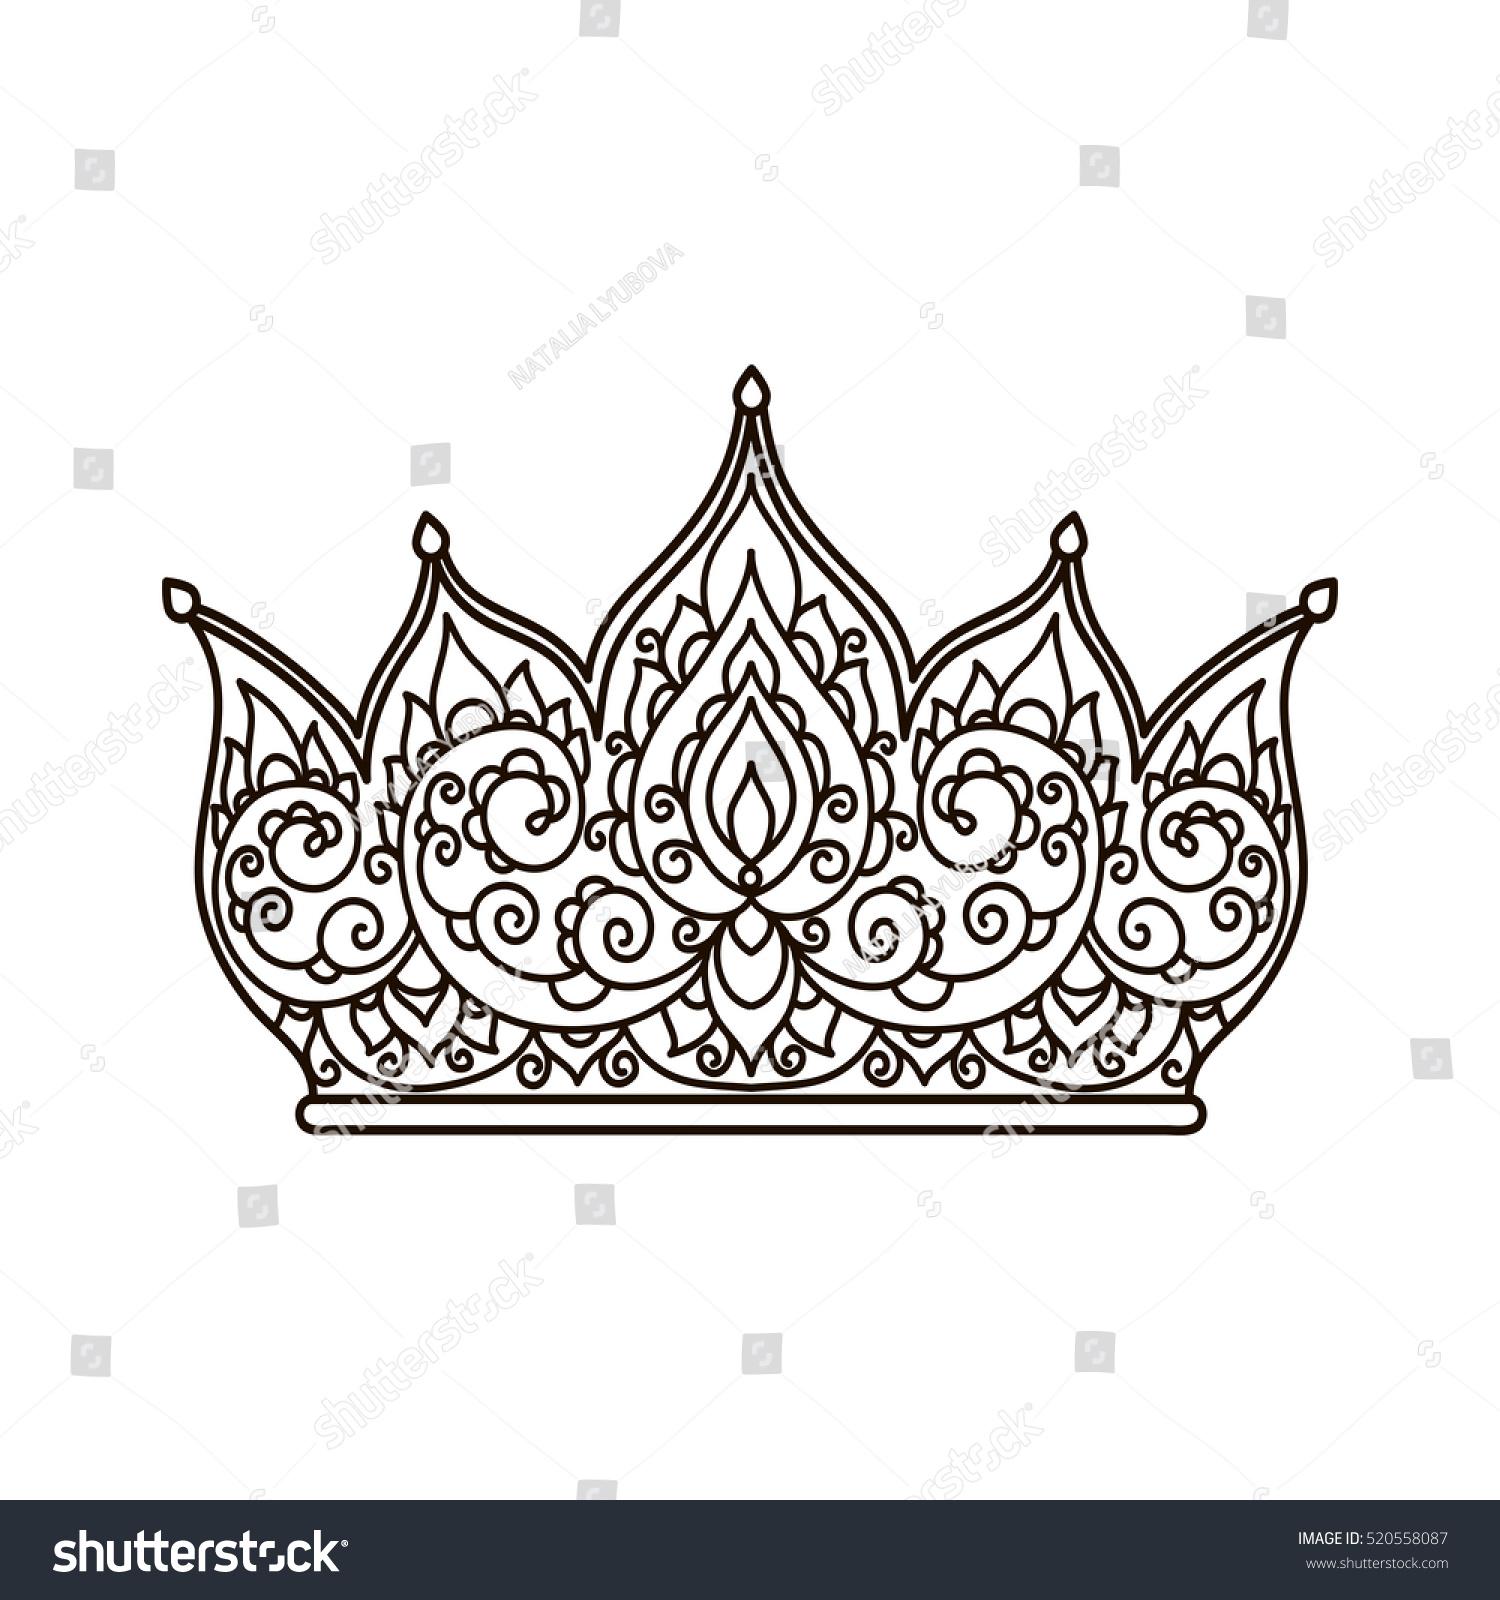 Enchanting King Crown Coloring Pages Festooning - Resume Template ...